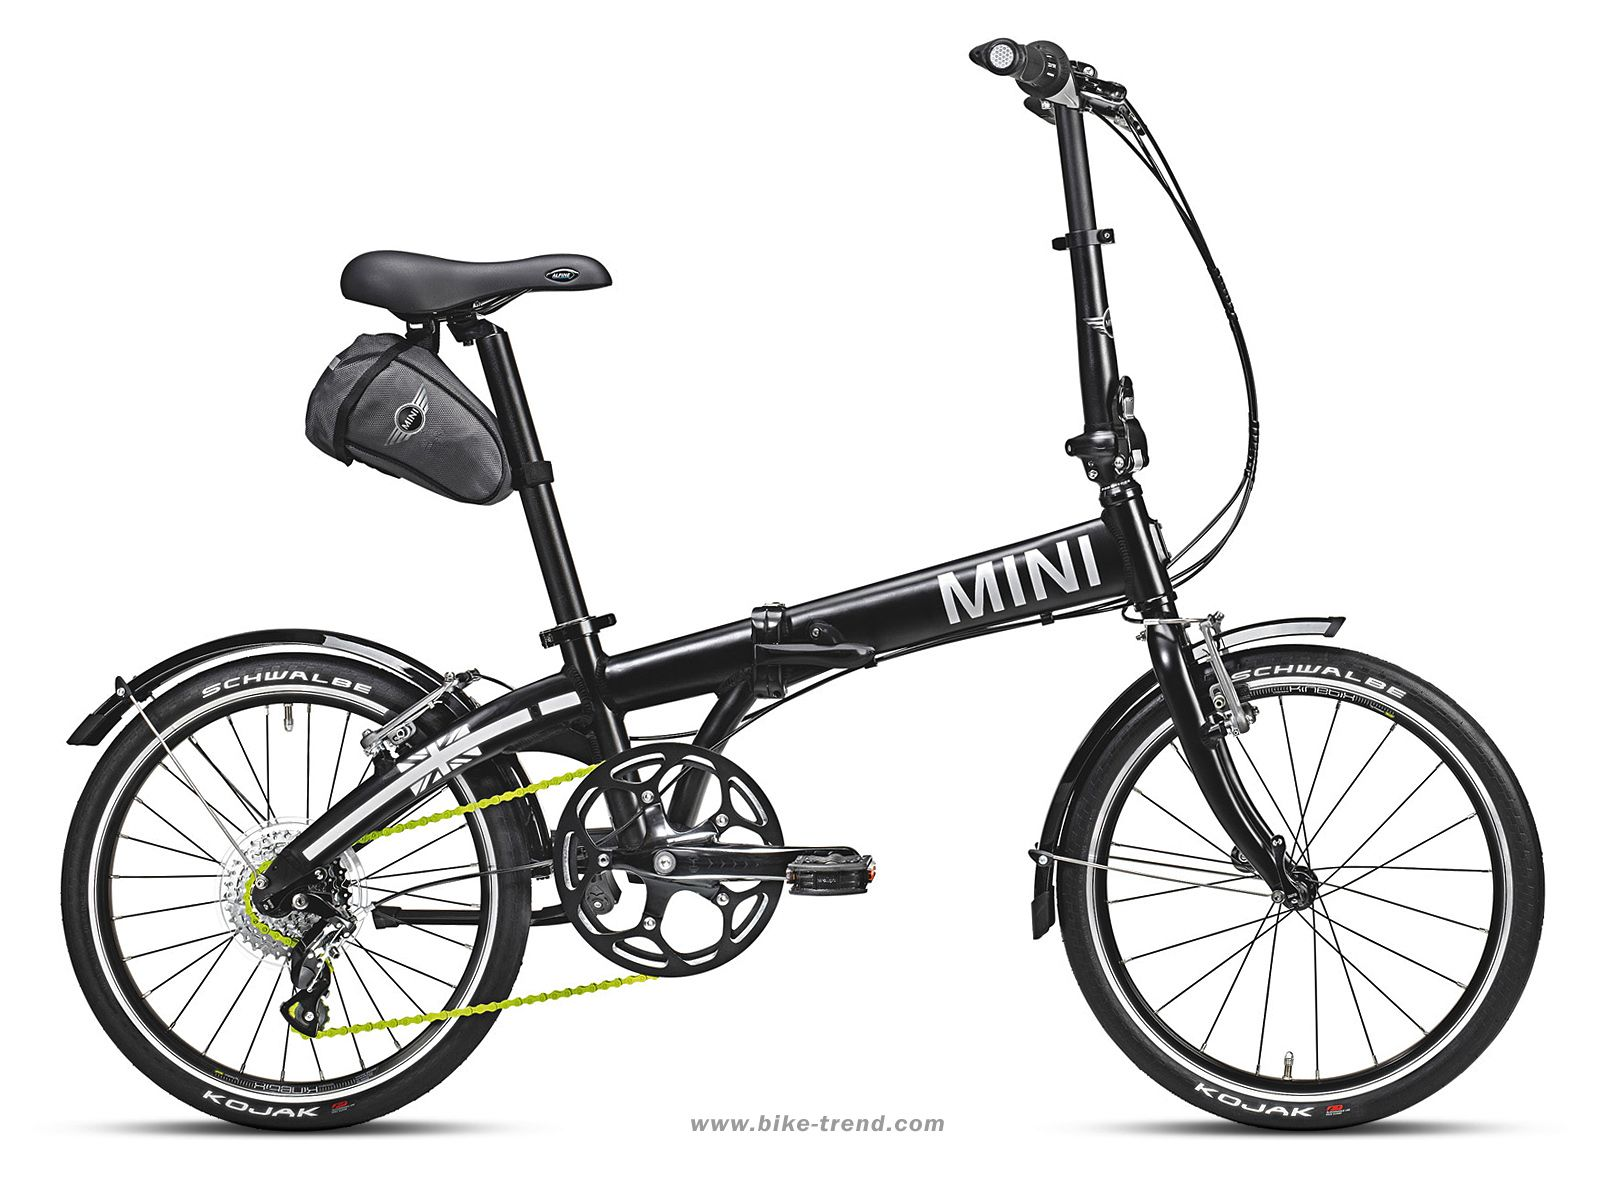 mini folding bike folding bikes pinterest bicycling. Black Bedroom Furniture Sets. Home Design Ideas